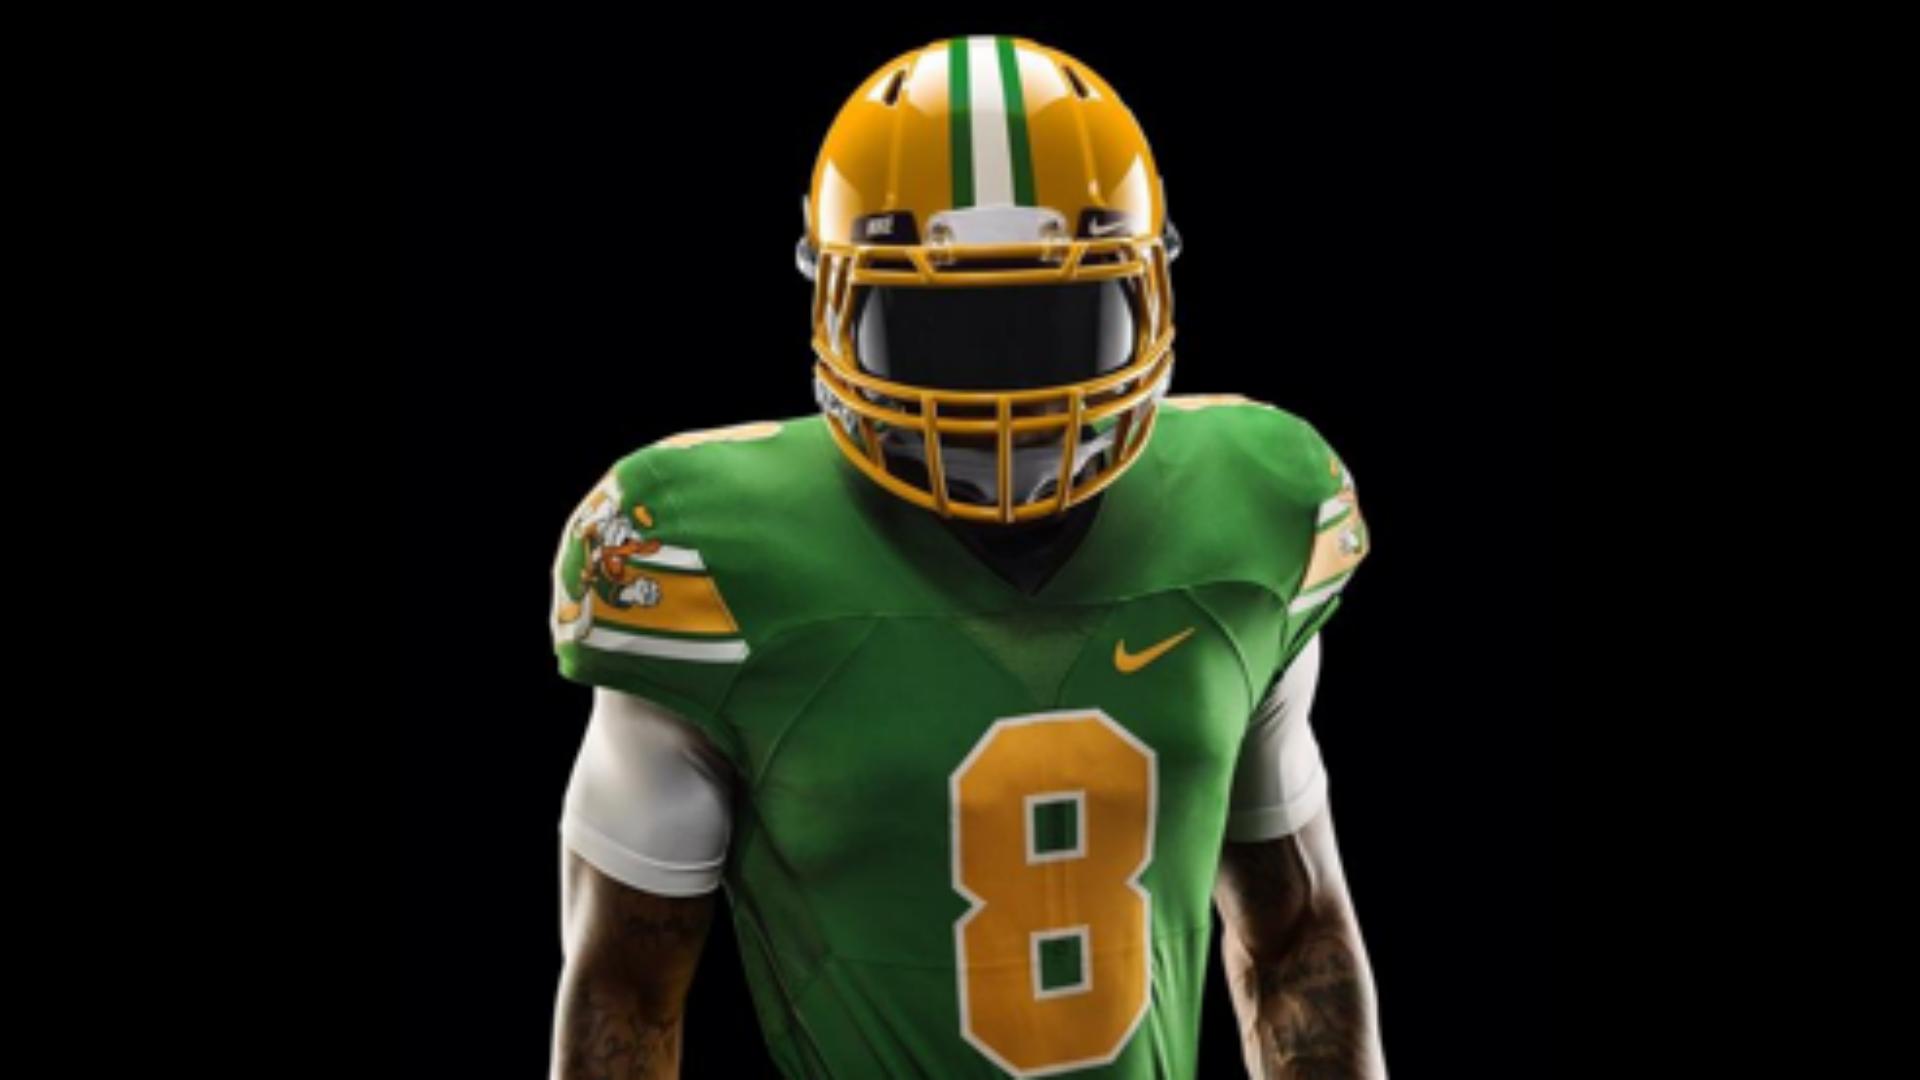 hot sale online 01af5 595f8 Ducks will wear retro uniforms against Washington | Sporting ...